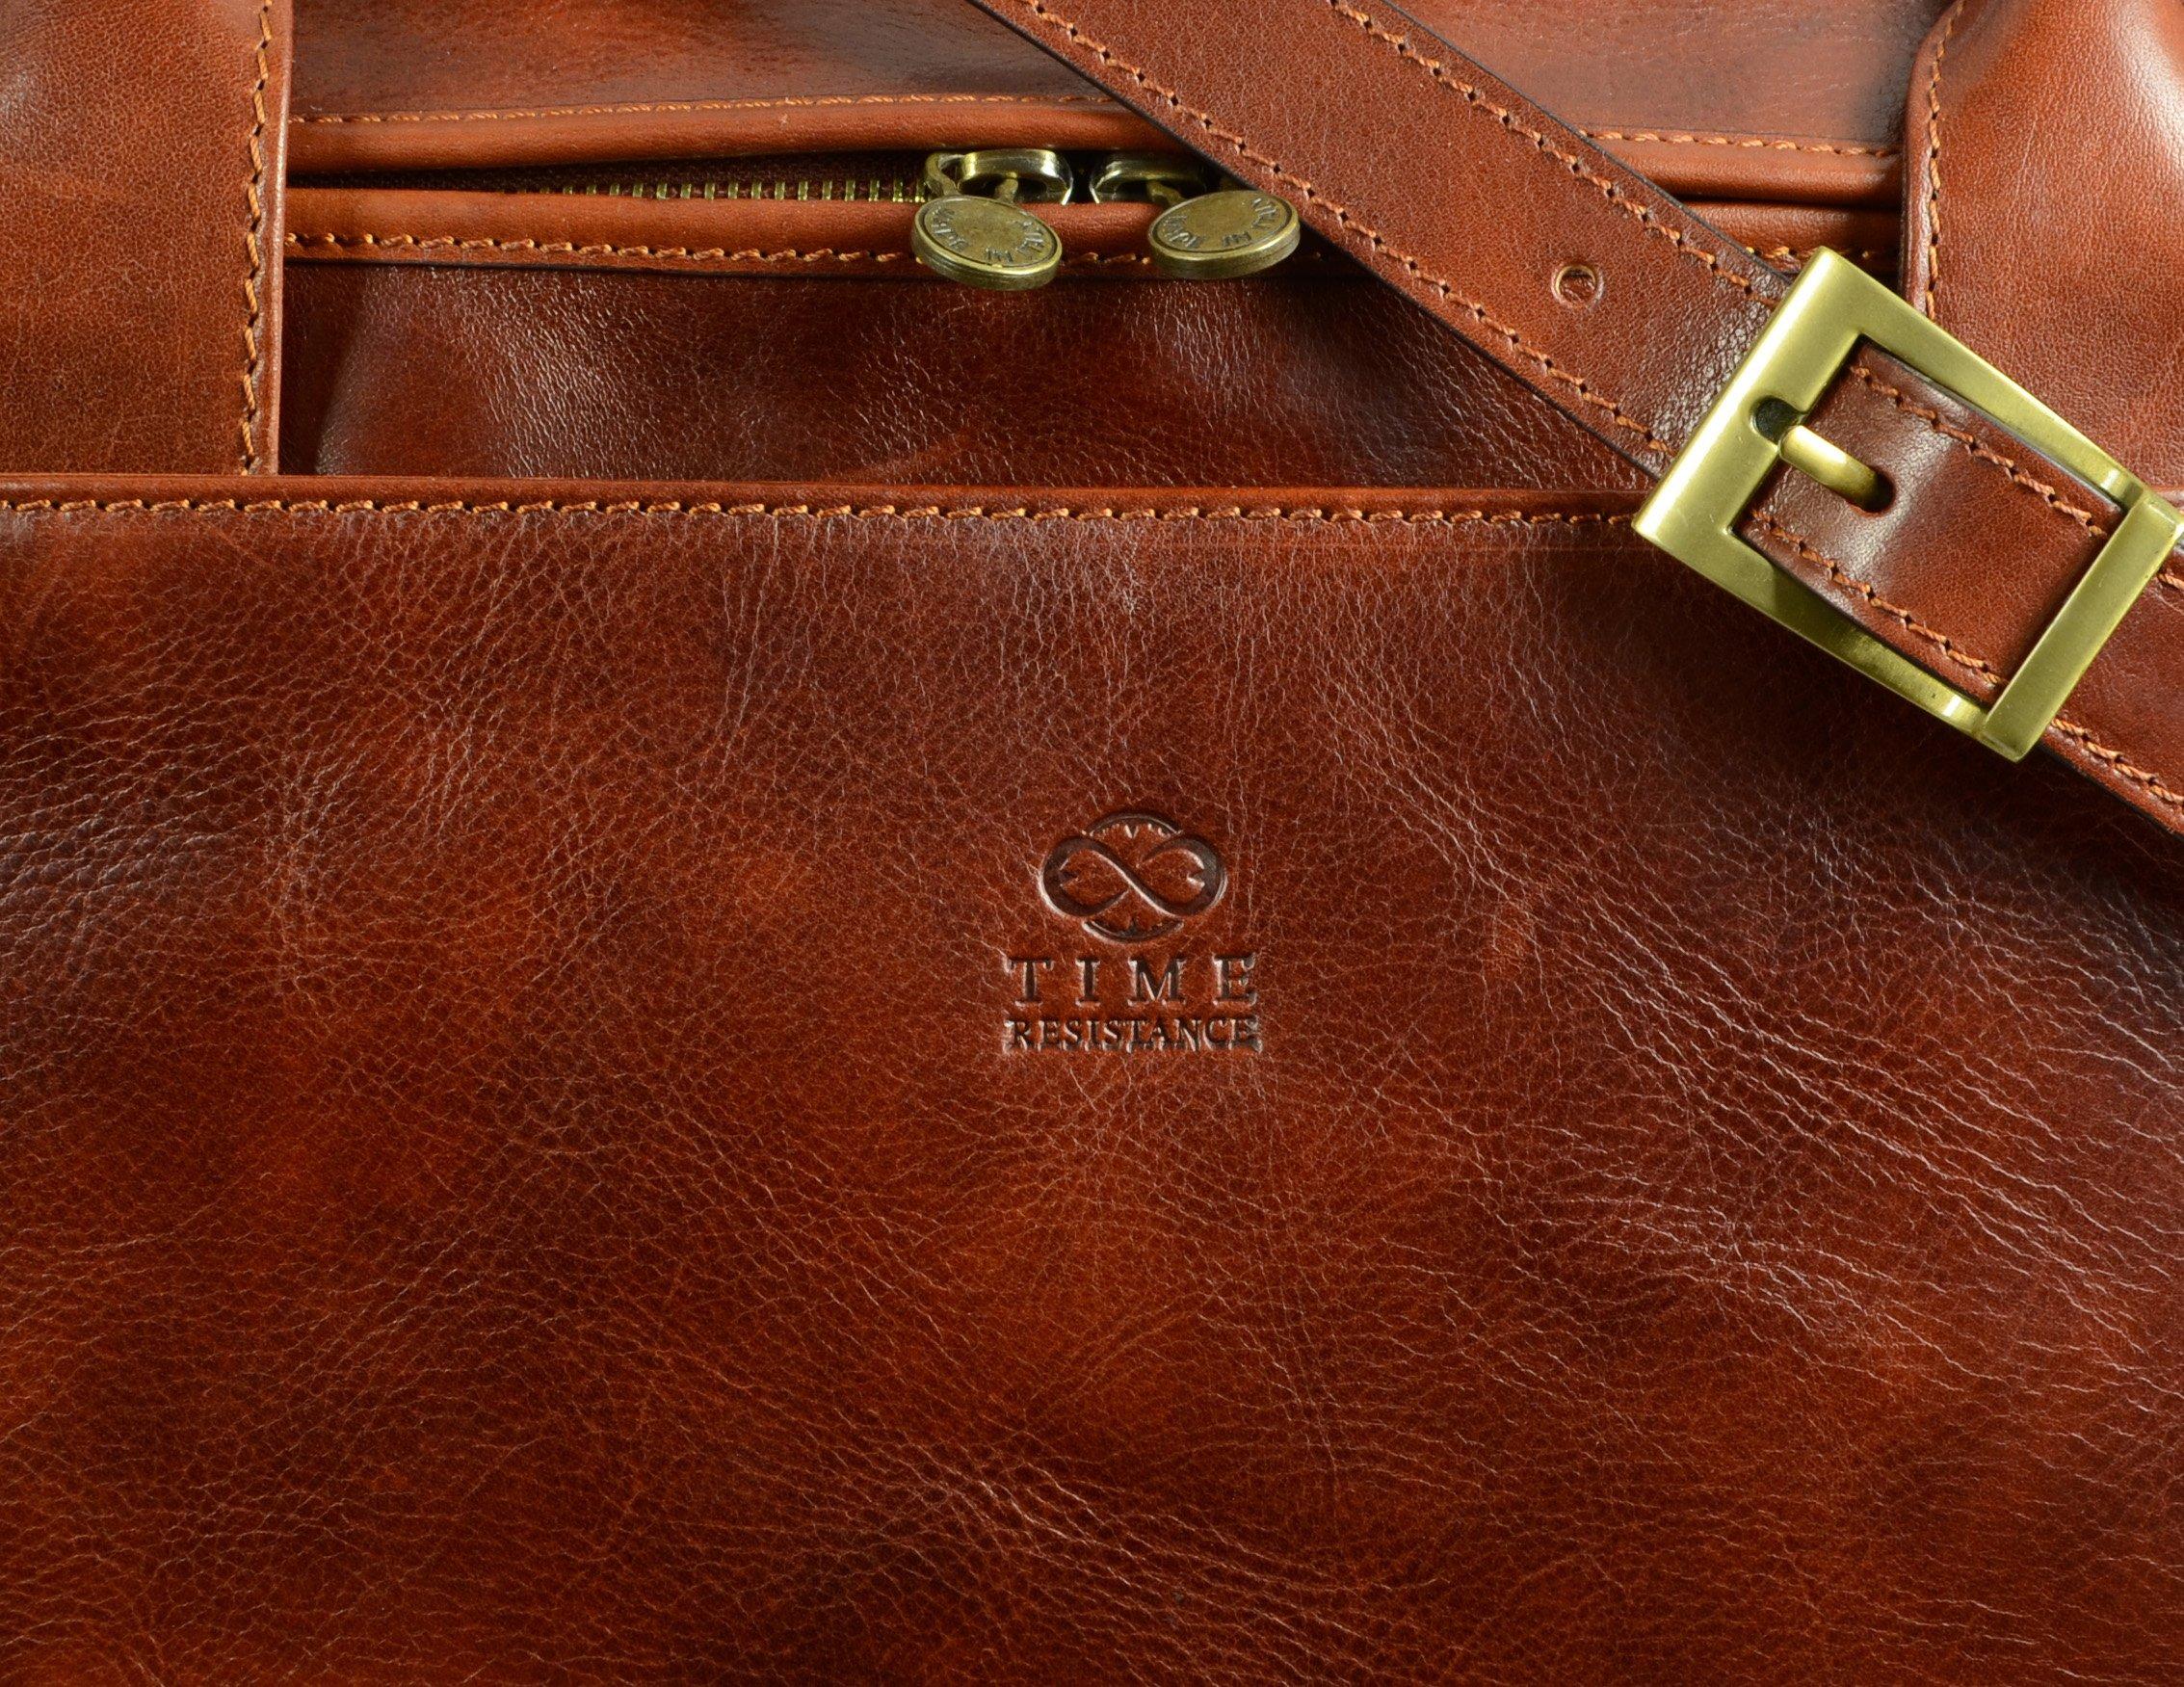 Leather Duffel Bag, Weekend Bag, Gym, Large Travel Bag, Cognac, Brown - Time Resistance by Time Resistance (Image #4)